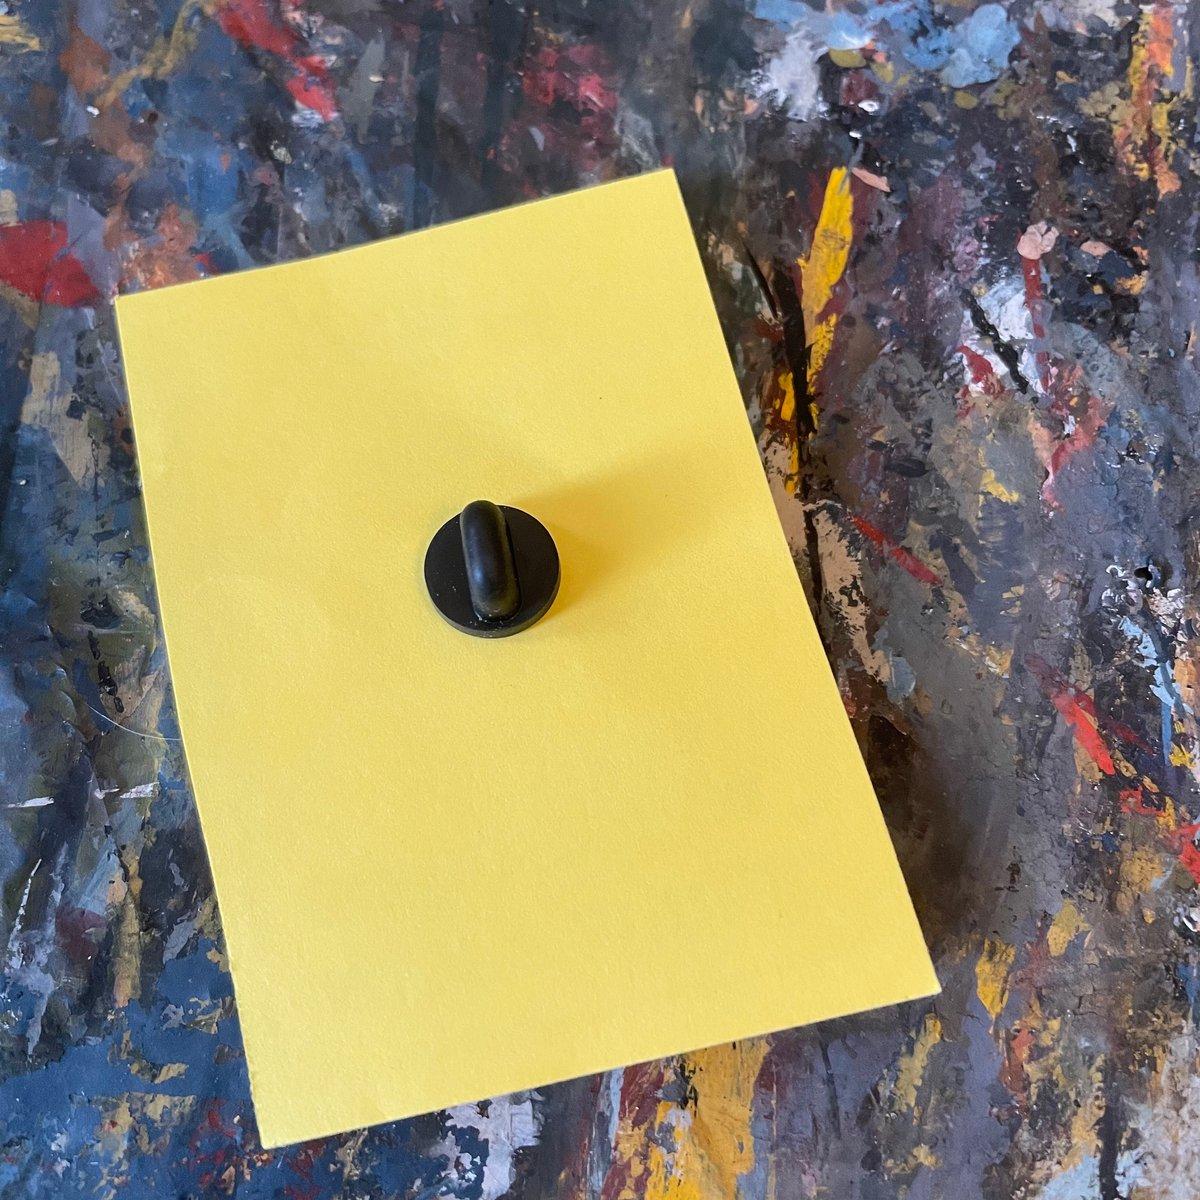 HEY BUDDY (Acrylic pin)